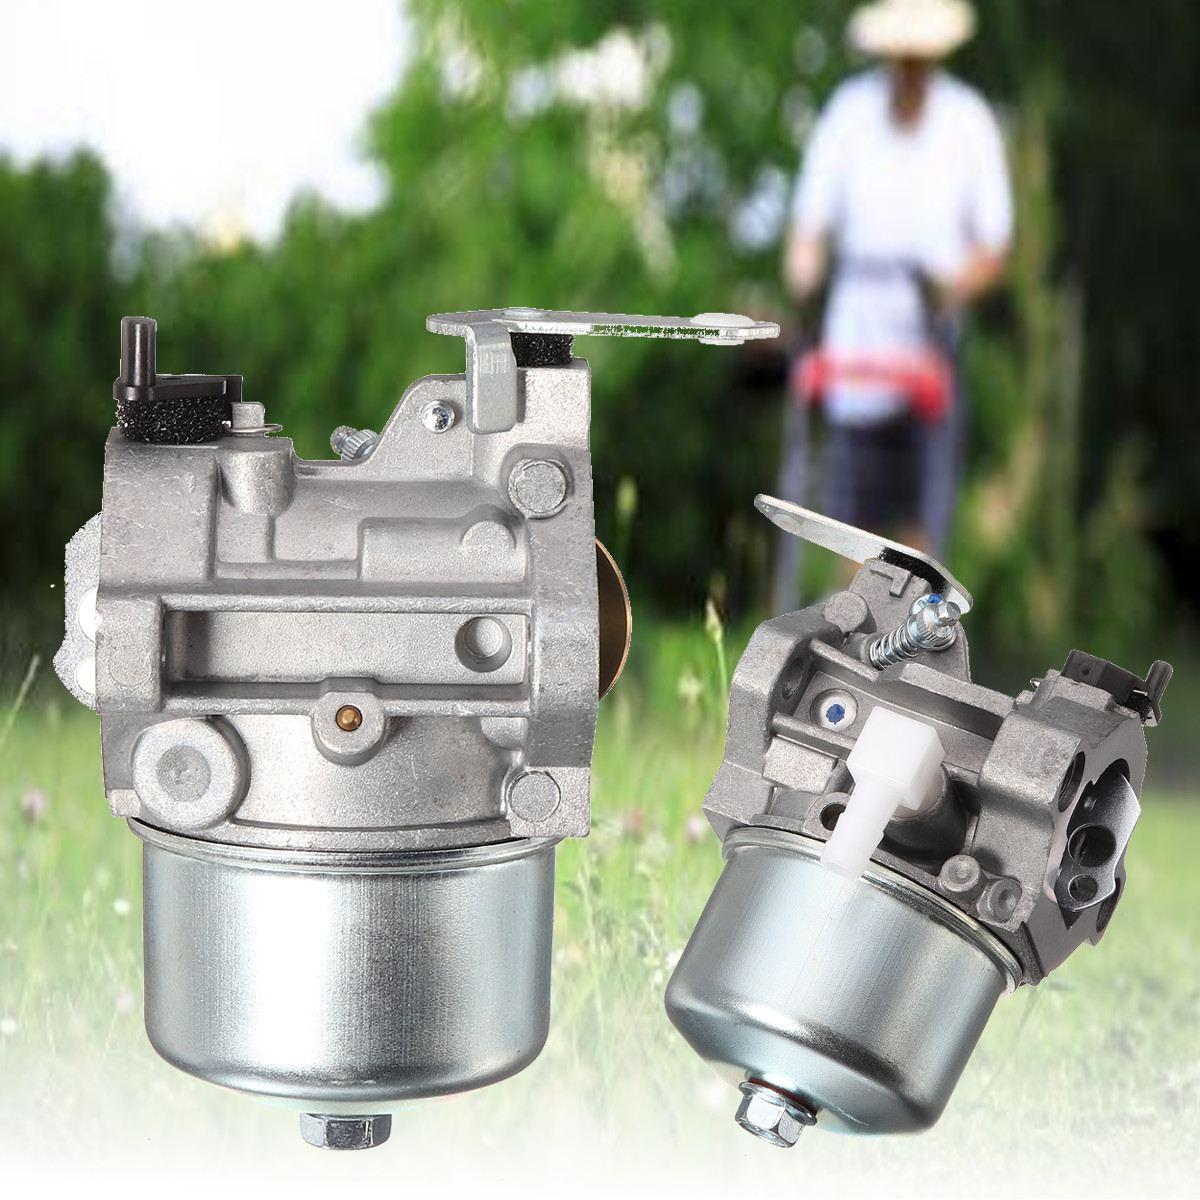 Aluminum Lawn Mower Carburetor Carb Parts Fit For Briggs Stratton 690119 694526 Snowblower Generator Recycle Mower